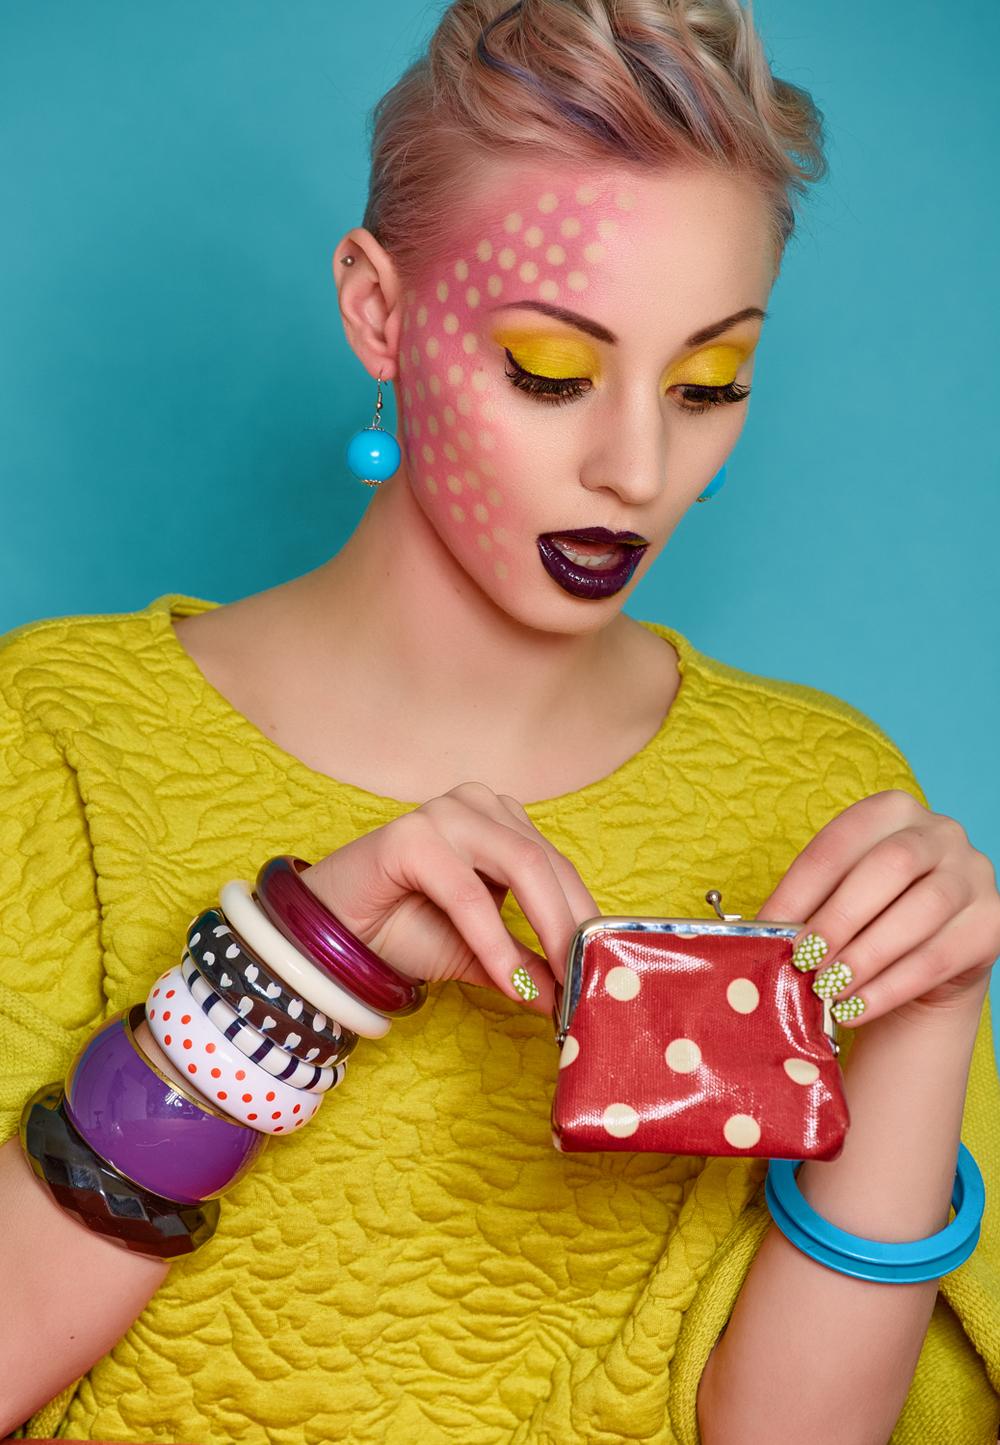 K14_0662-173-Kamal Mostofi-Beauty_ZyZi Makeup_Sally_80s.jpg